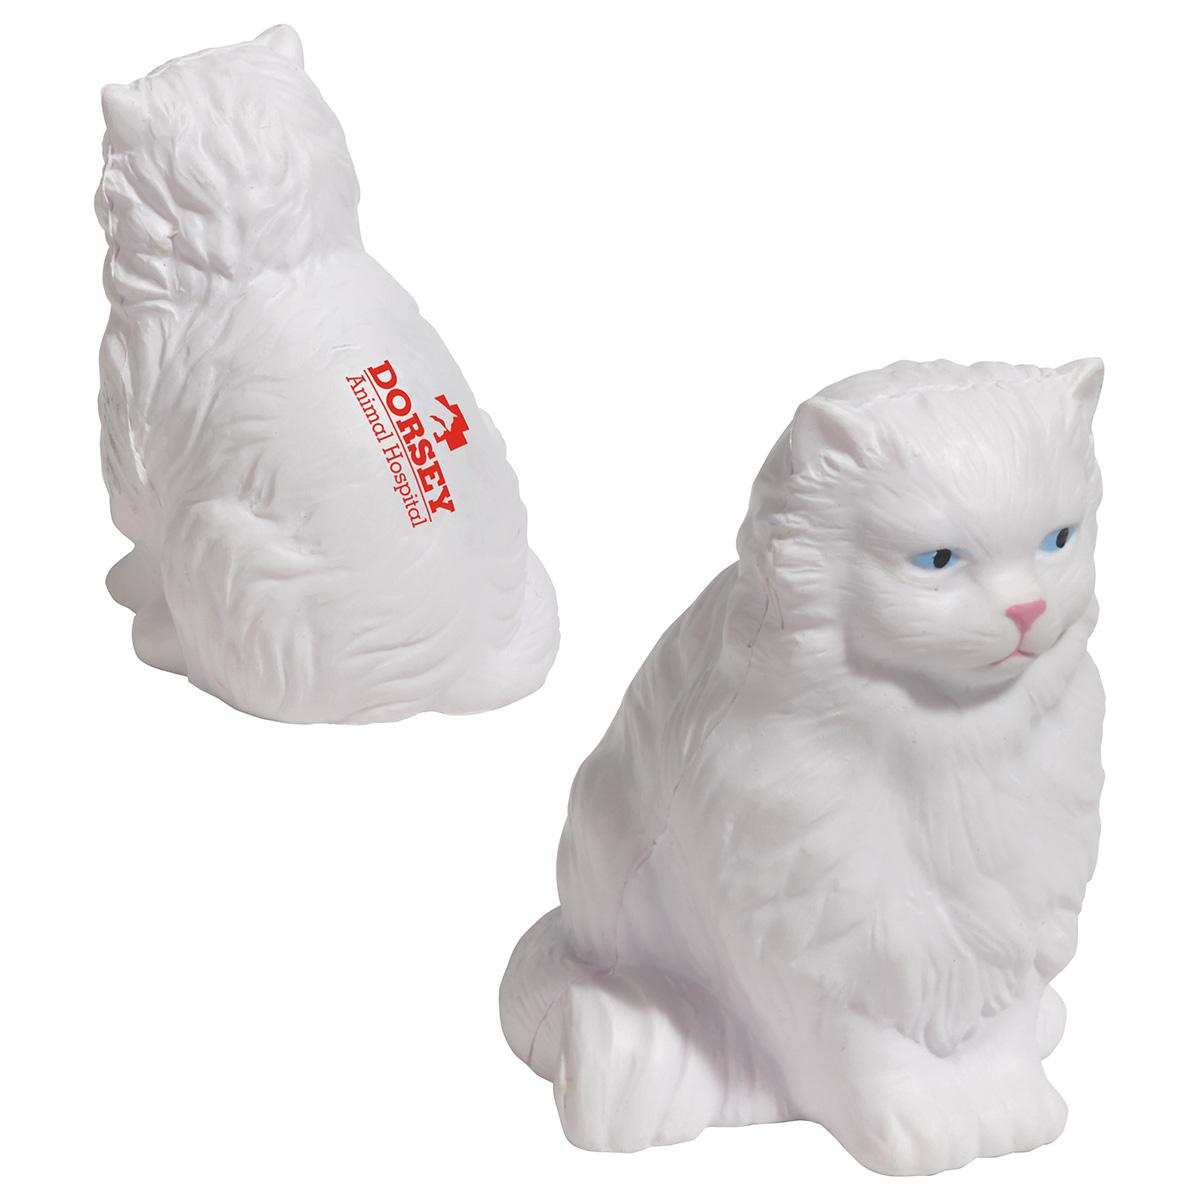 Persian Cat Stress Reliever, LPE-PC34 - 1 Colour Imprint